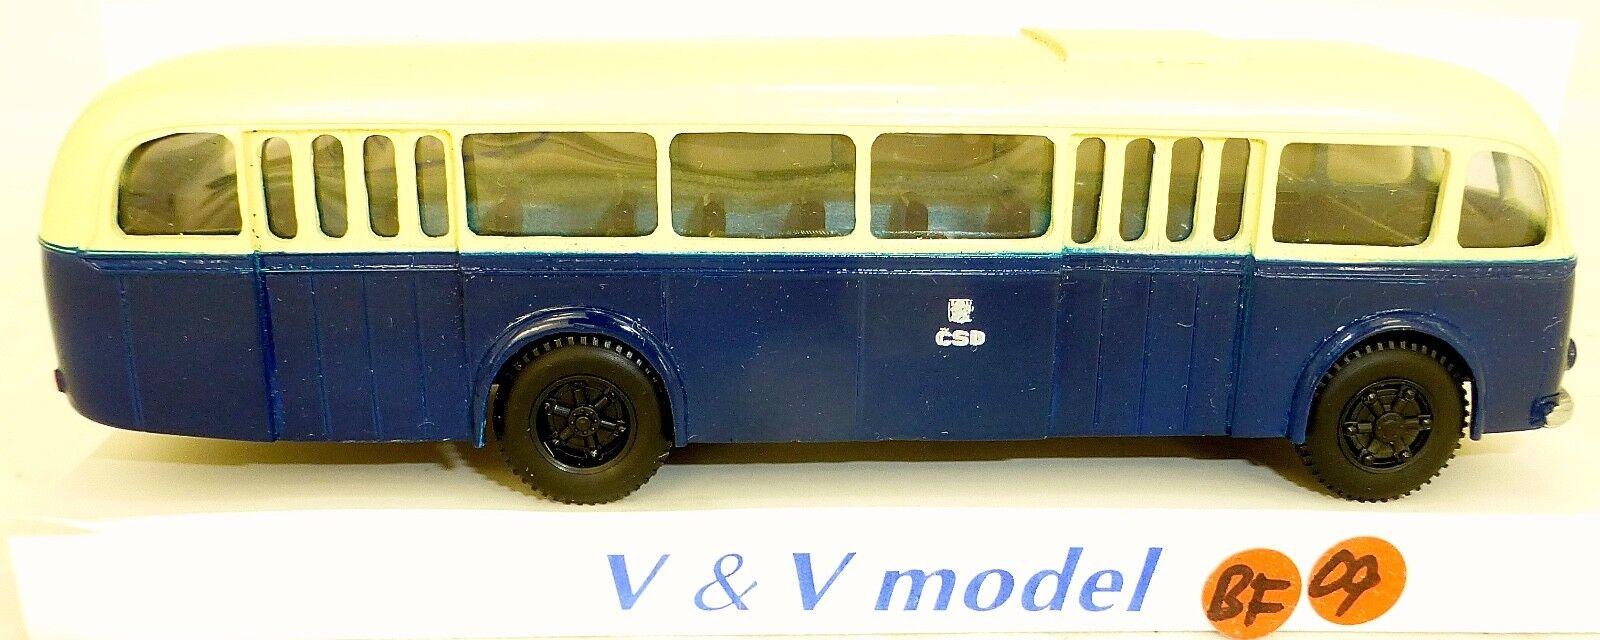 CSD 1947 Skoda typ 706 RO mestsky Bus V&V 218 H0 1 87 BF09 å